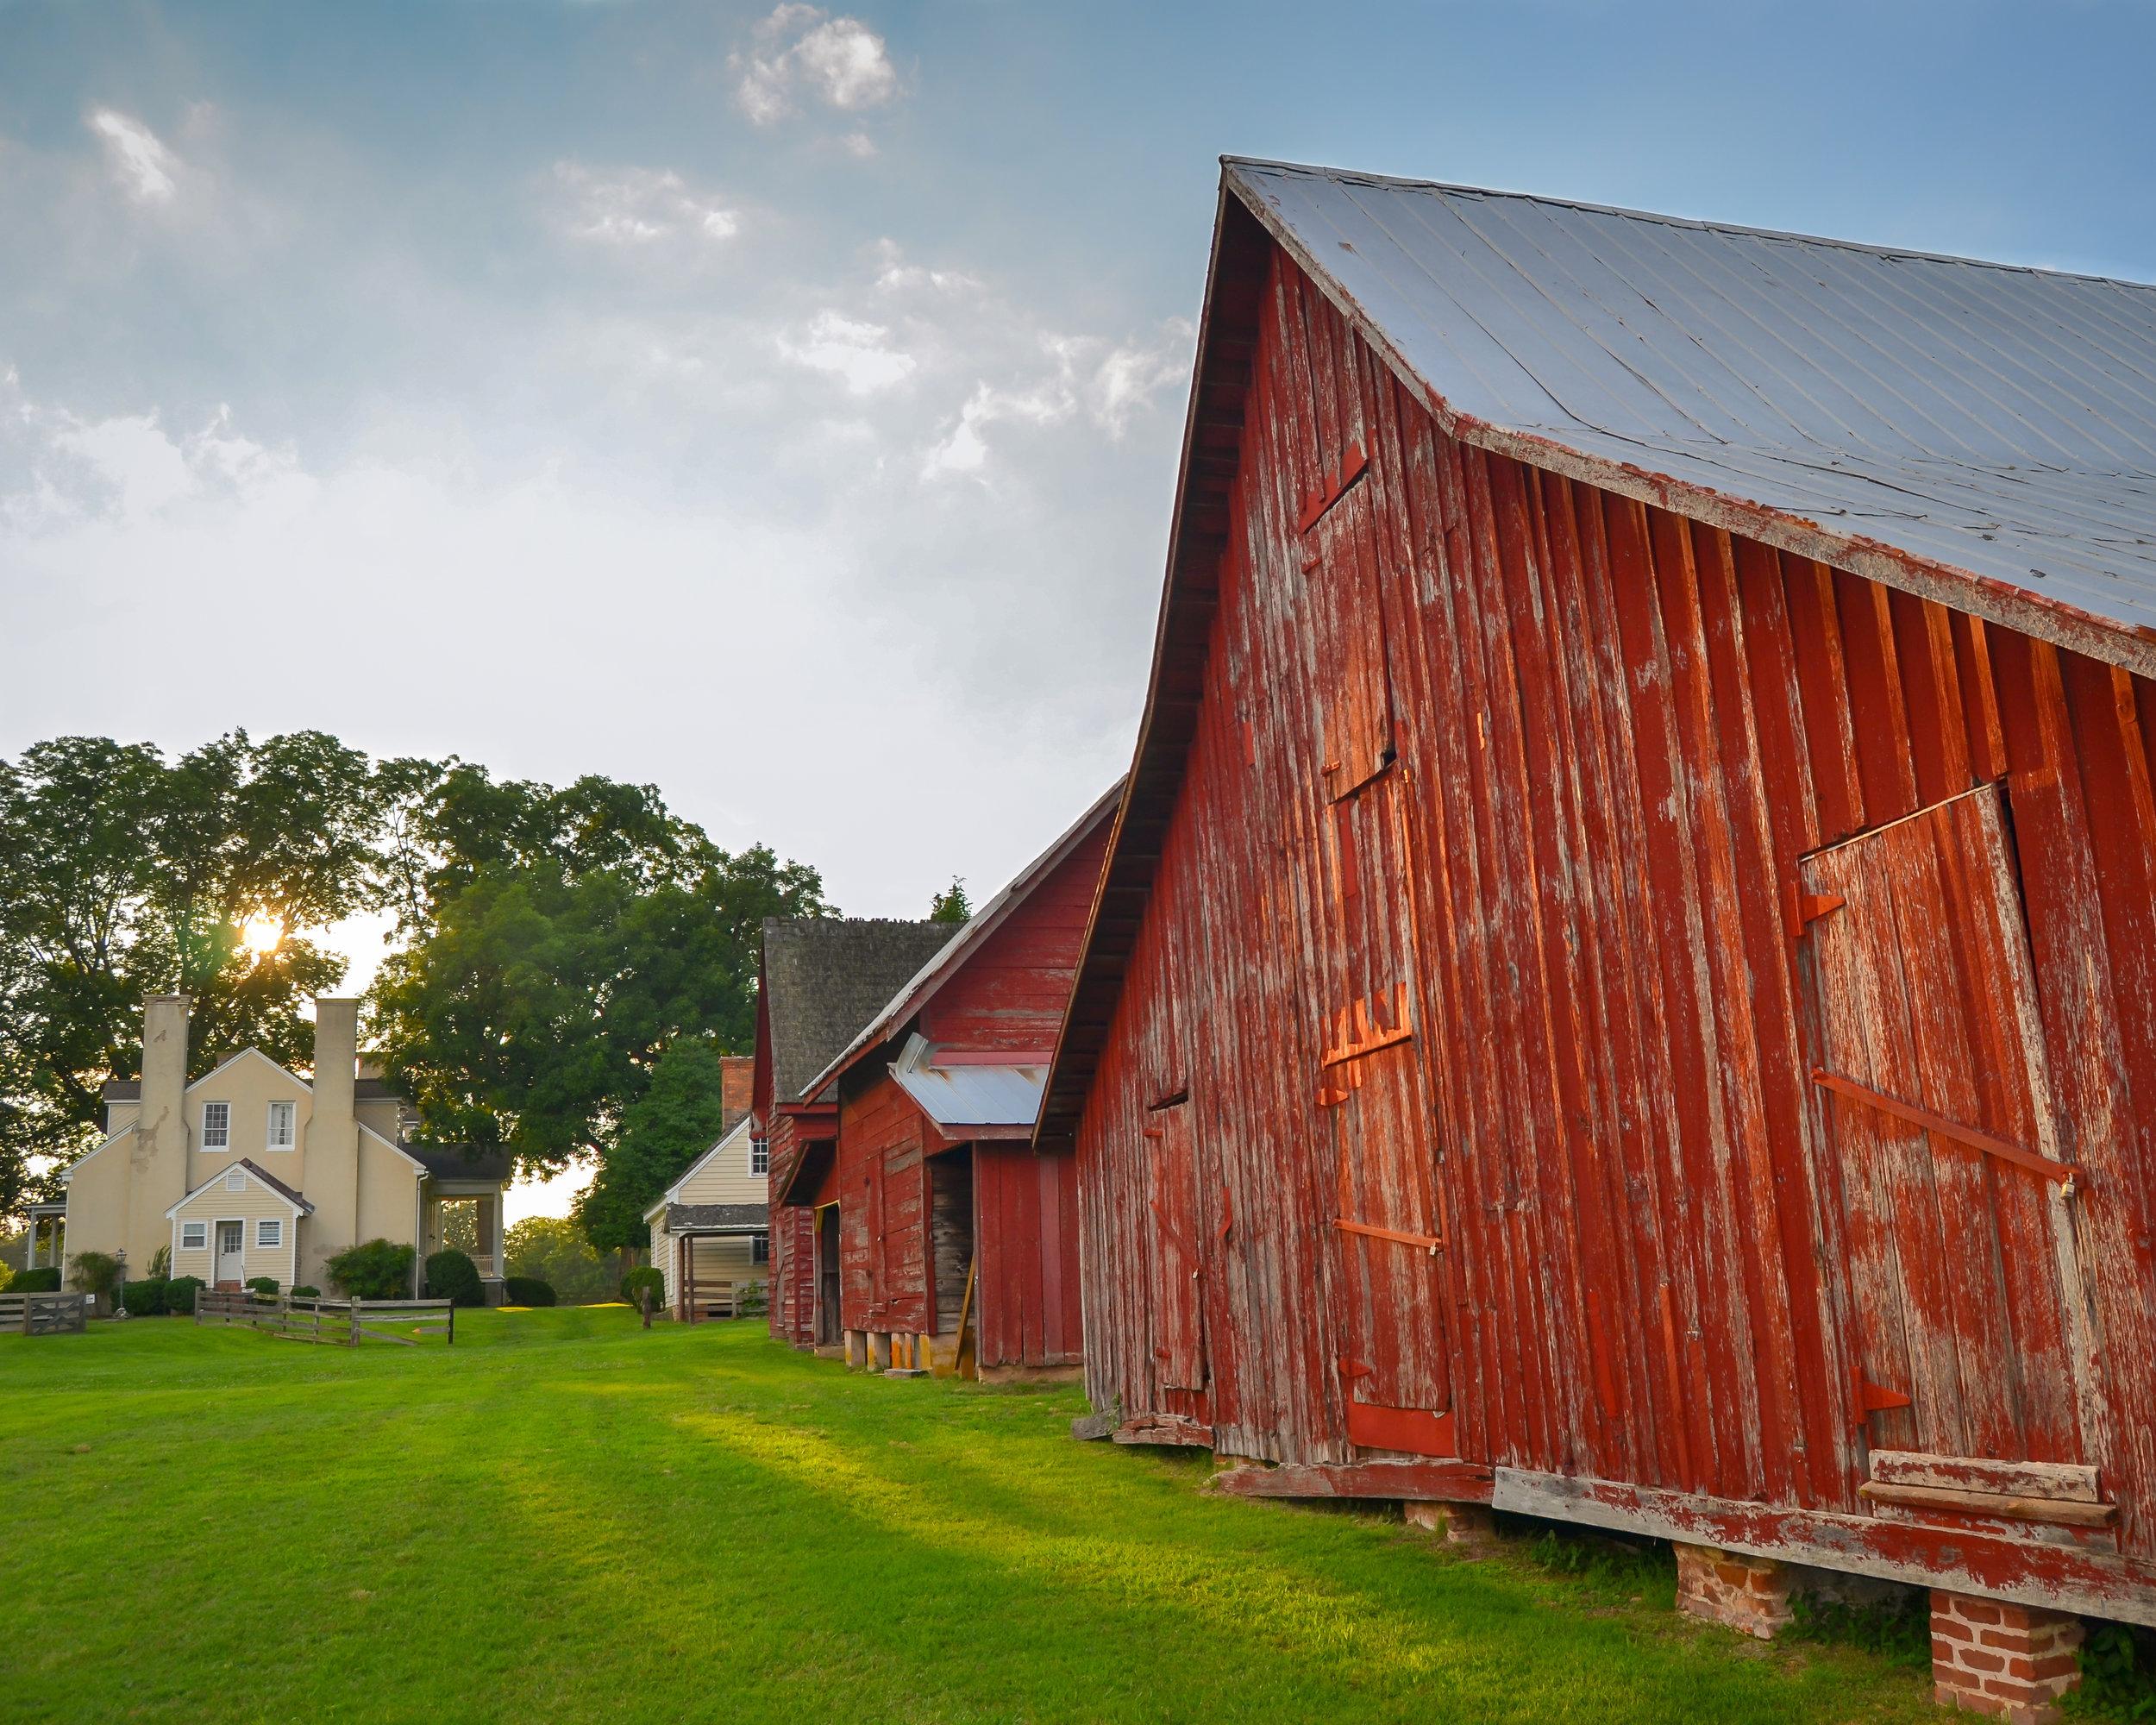 red barn-barn-Smithfield-Virginia-Isle of Wight.jpg